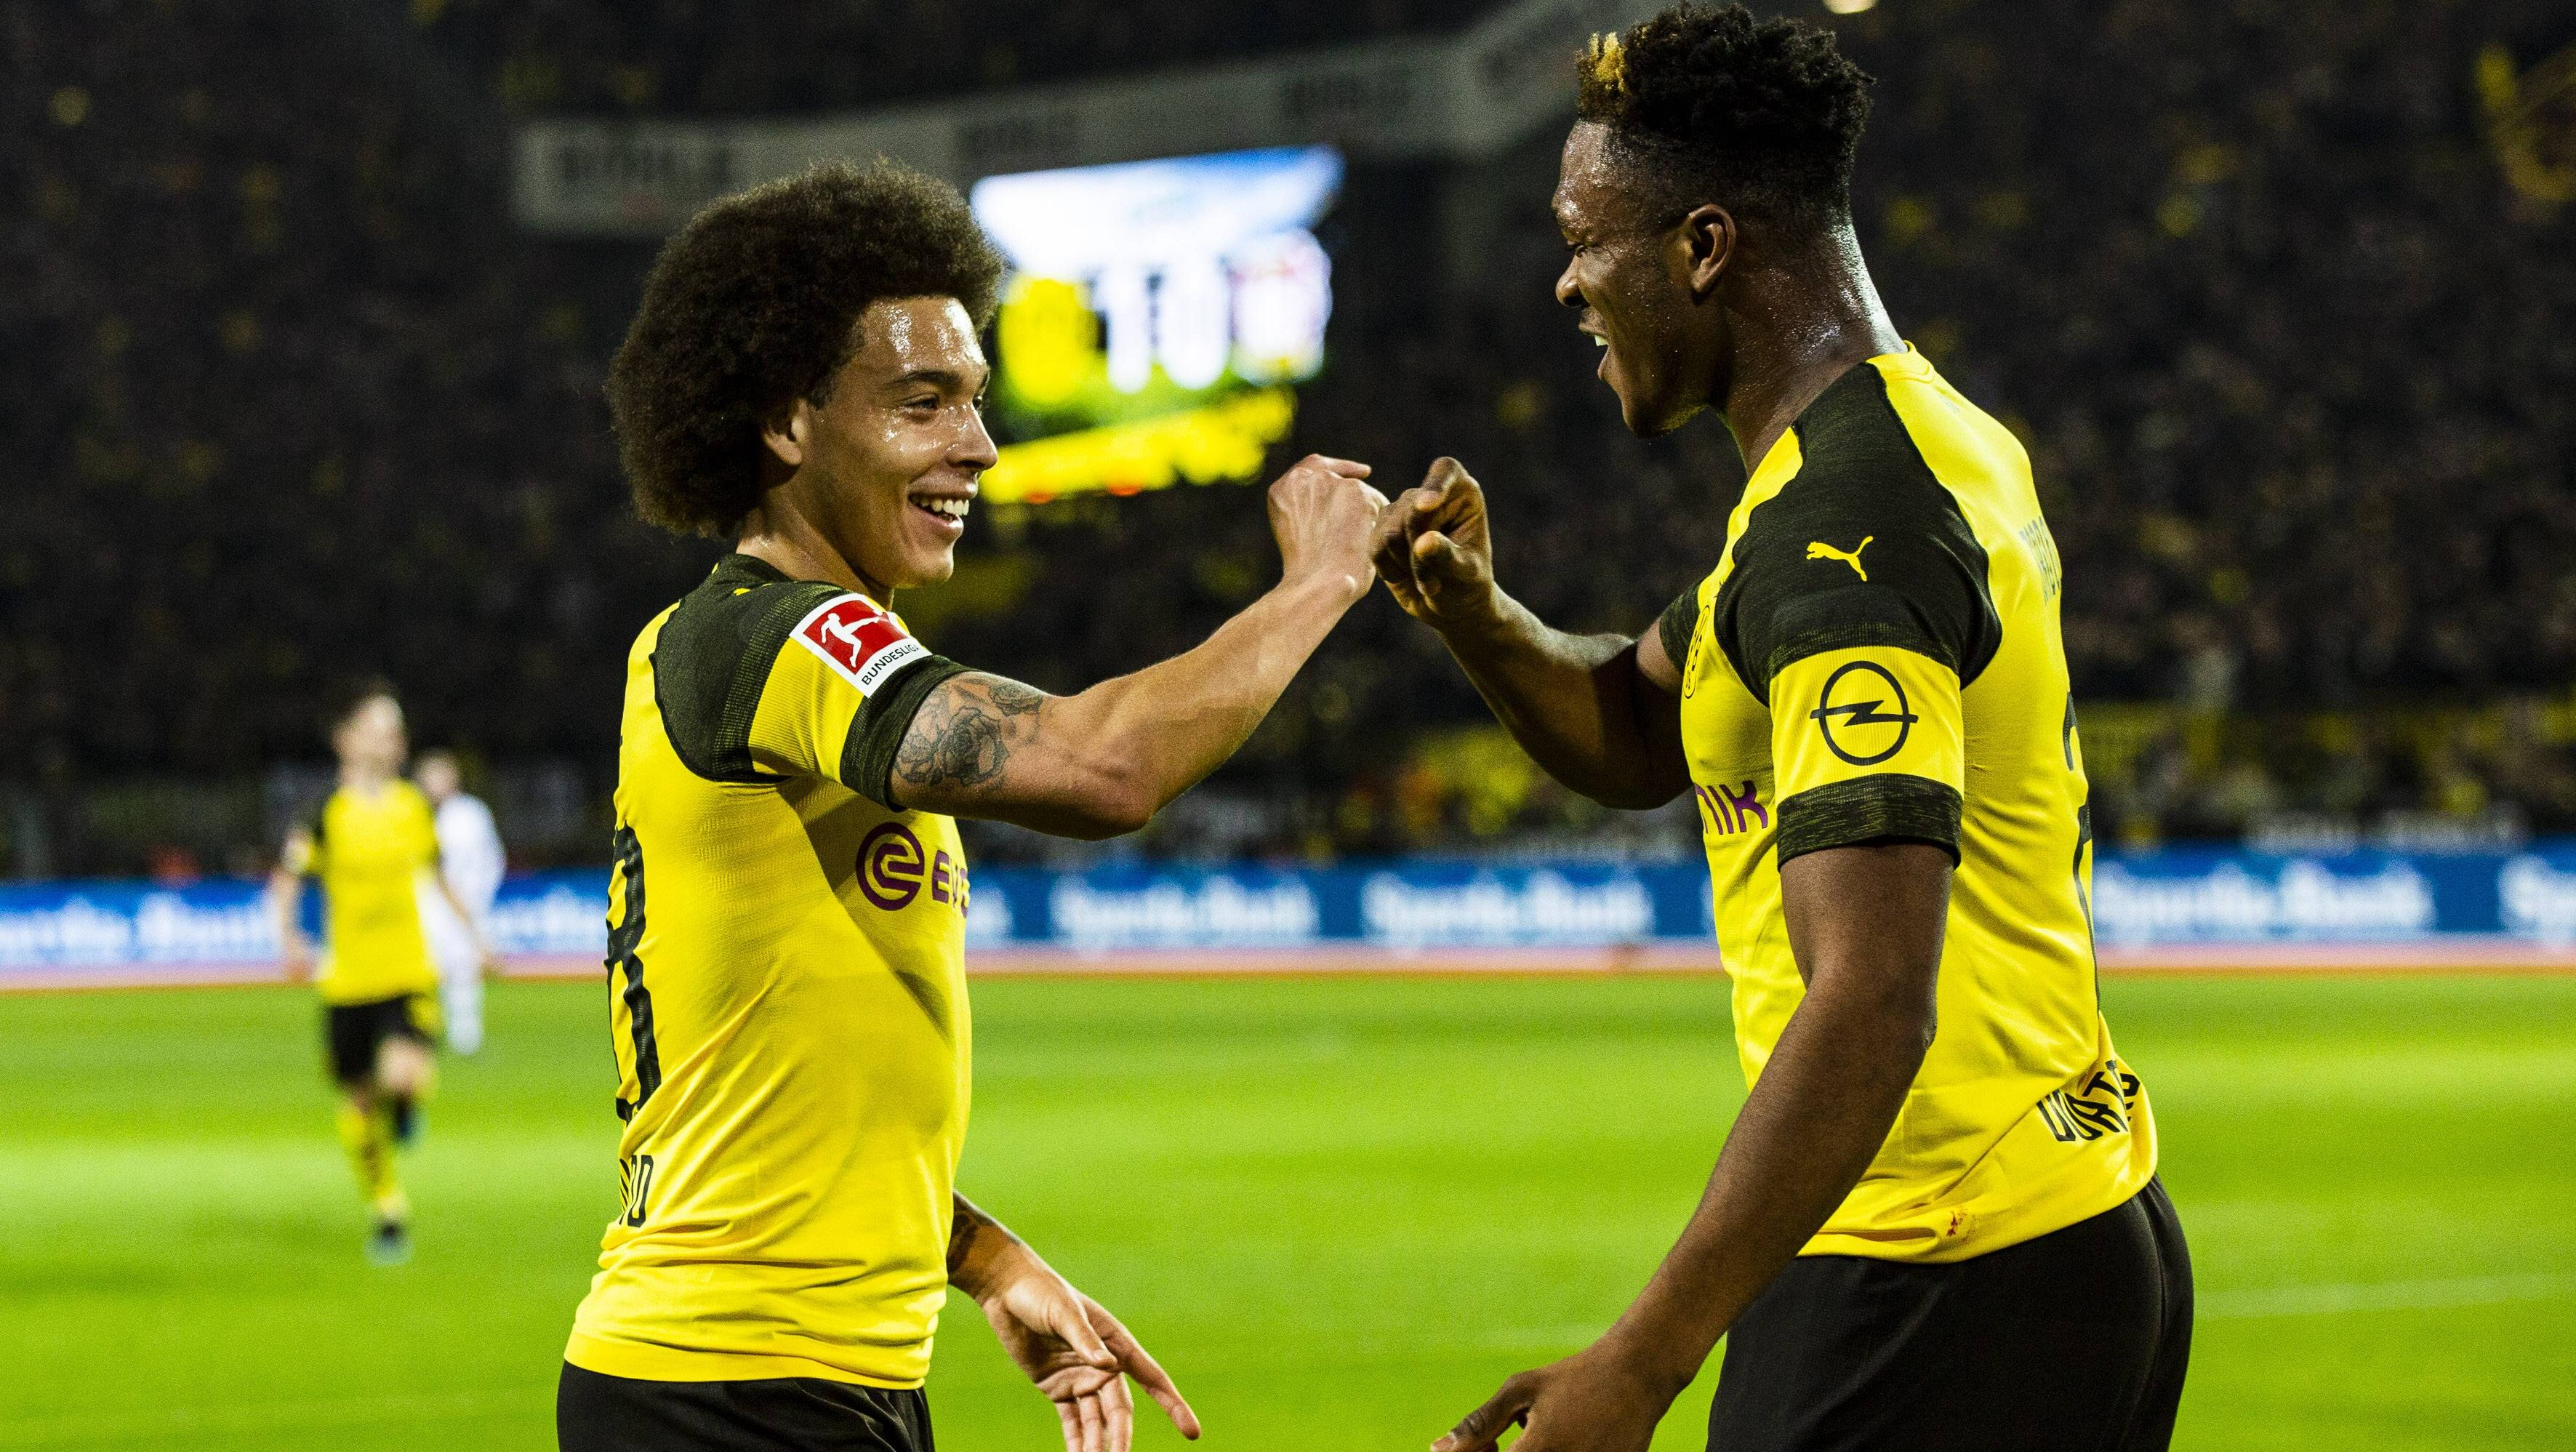 Bundesliga | Borussia Dortmund spreading the goals as Dan-Axel Zagadou  becomes 18th different scorer